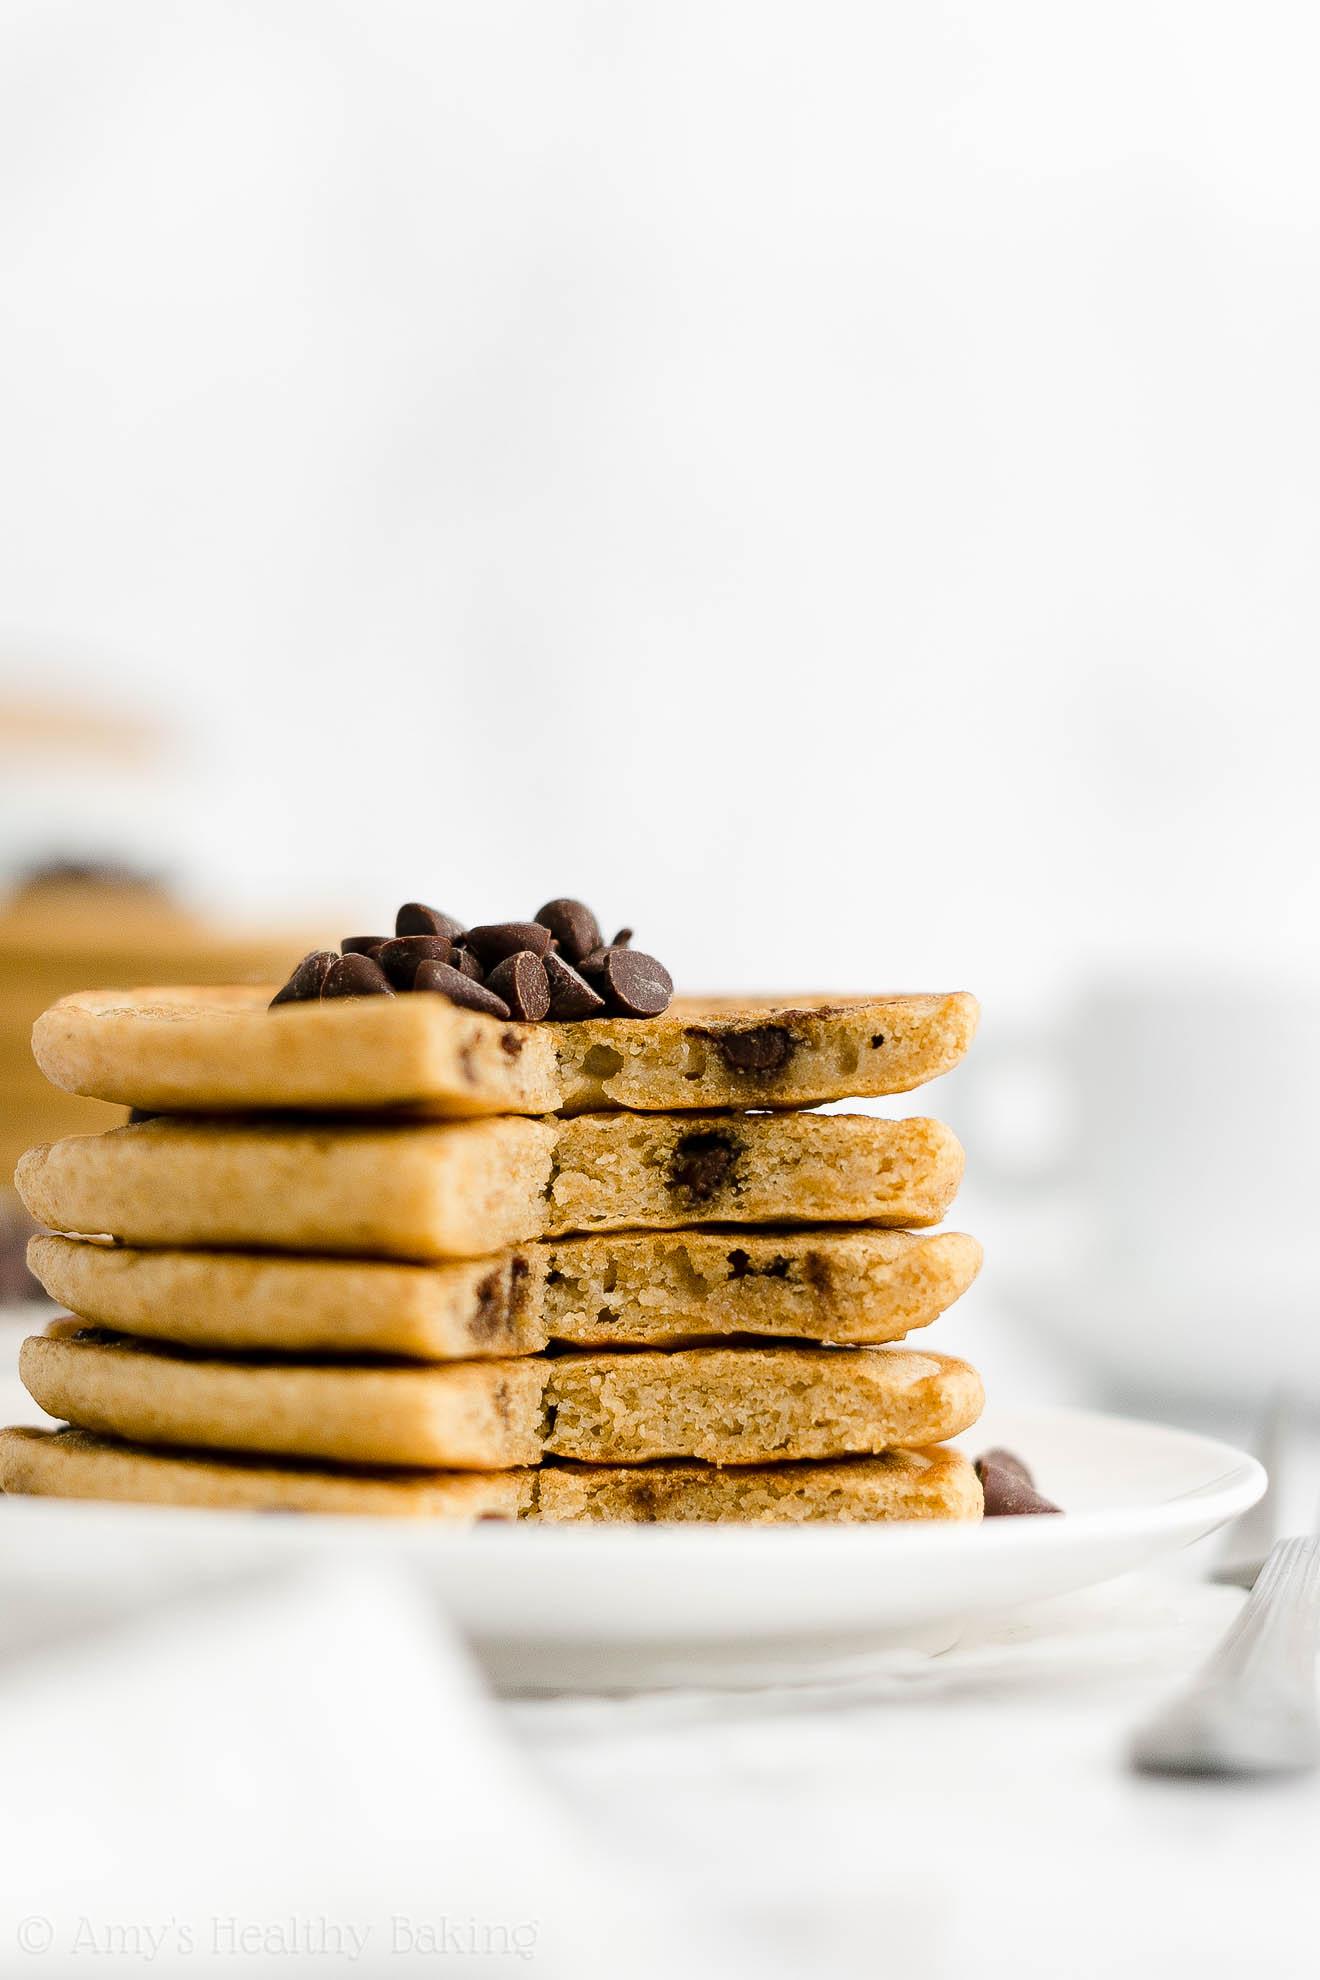 ULTIMATE Best Easy Healthy Whole Wheat Greek Yogurt Chocolate Chip Pancakes